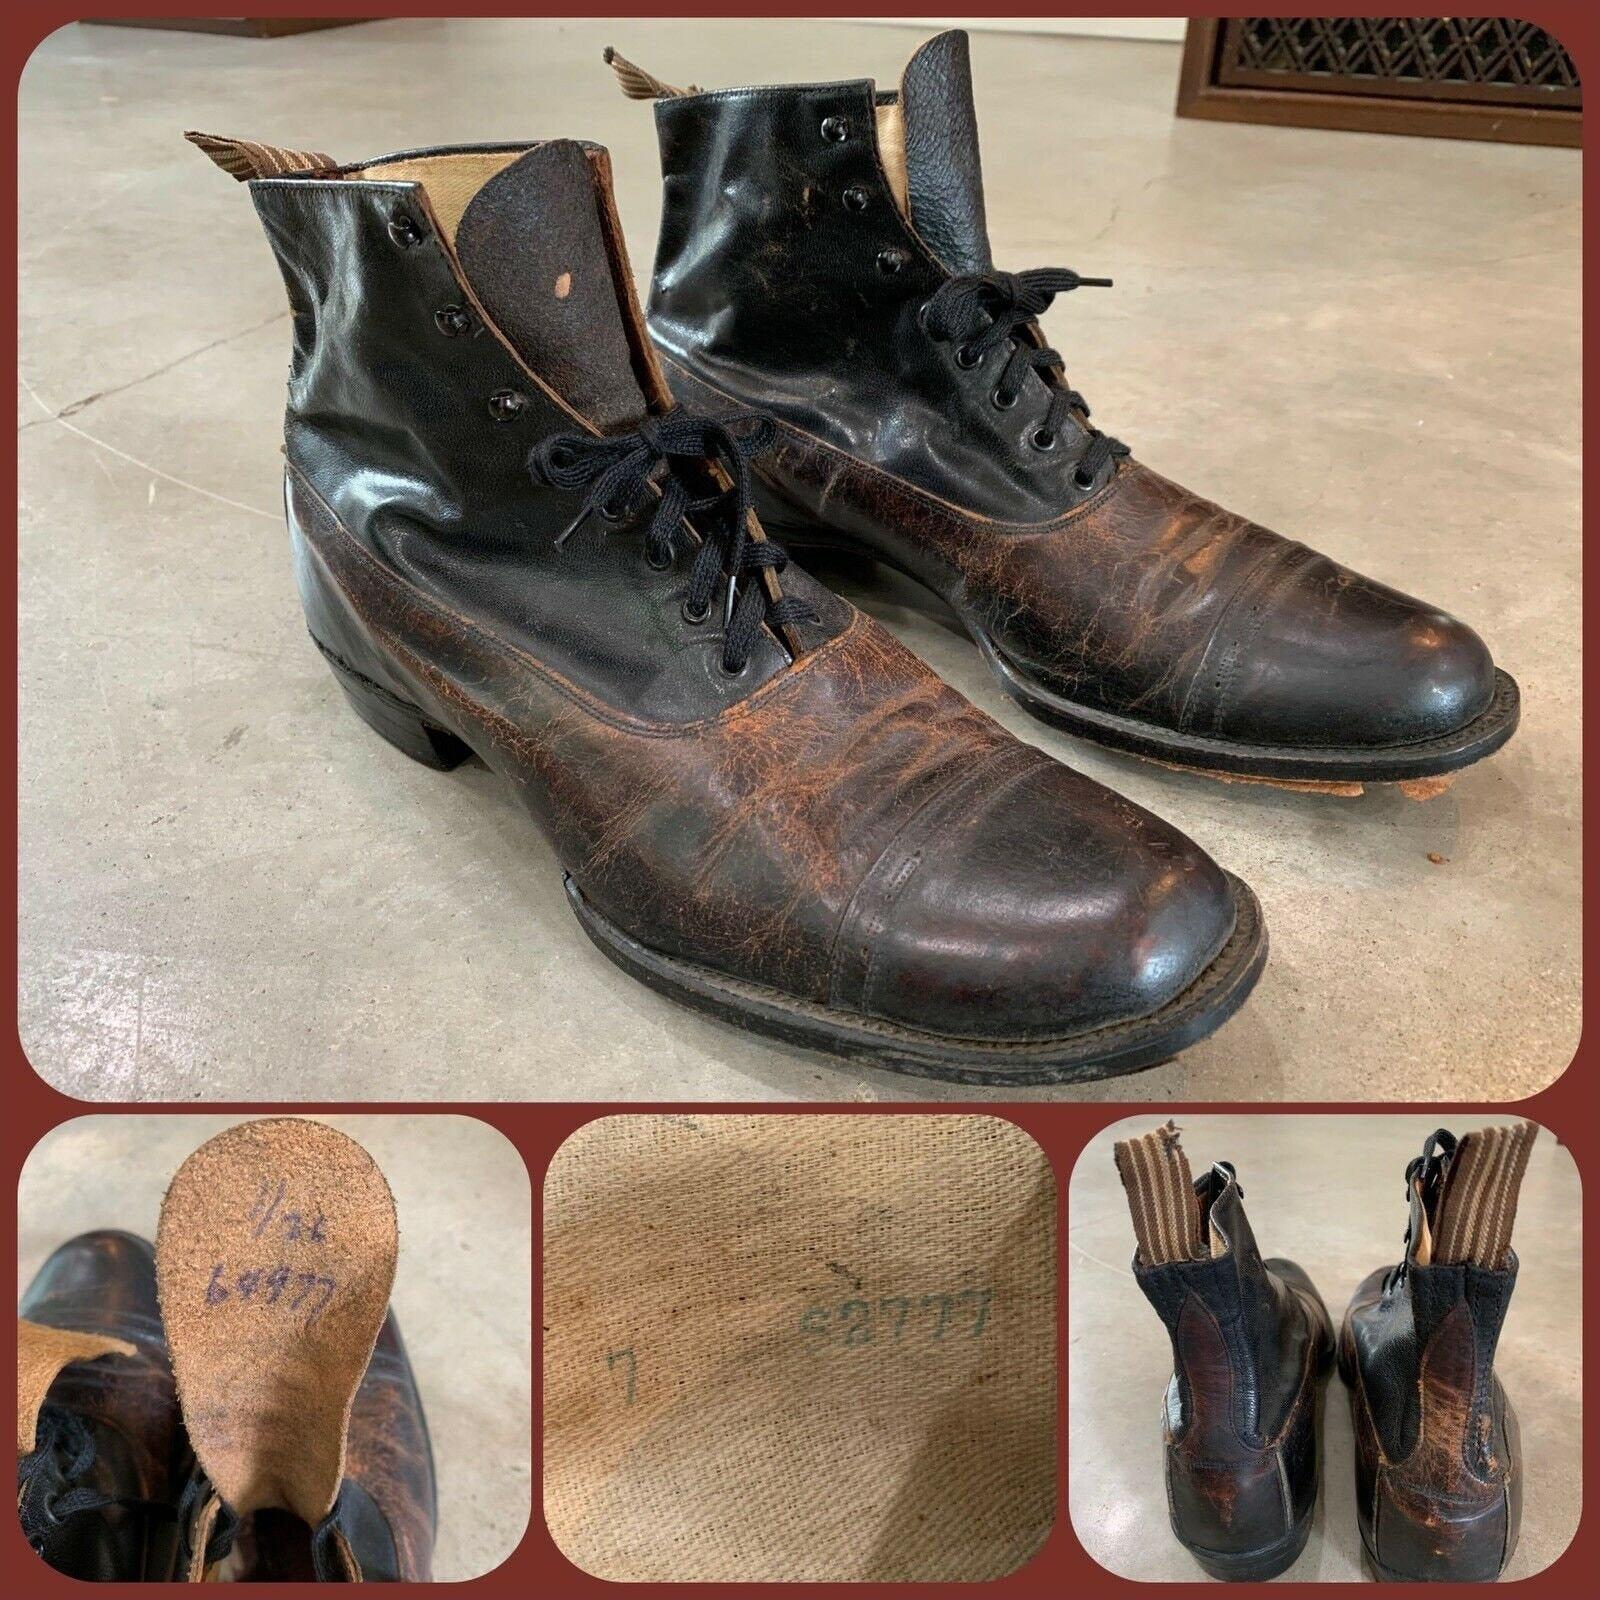 Men's 1920s Style Ties, Neck Ties & Bowties Antique Victorian Cap Toe Ankle Boot 2 Tone Dress Shoe Steampunk Wedding Tux Mens Size 7 Womens 9 Dandy Bespoke Formal Edwardian $87.50 AT vintagedancer.com